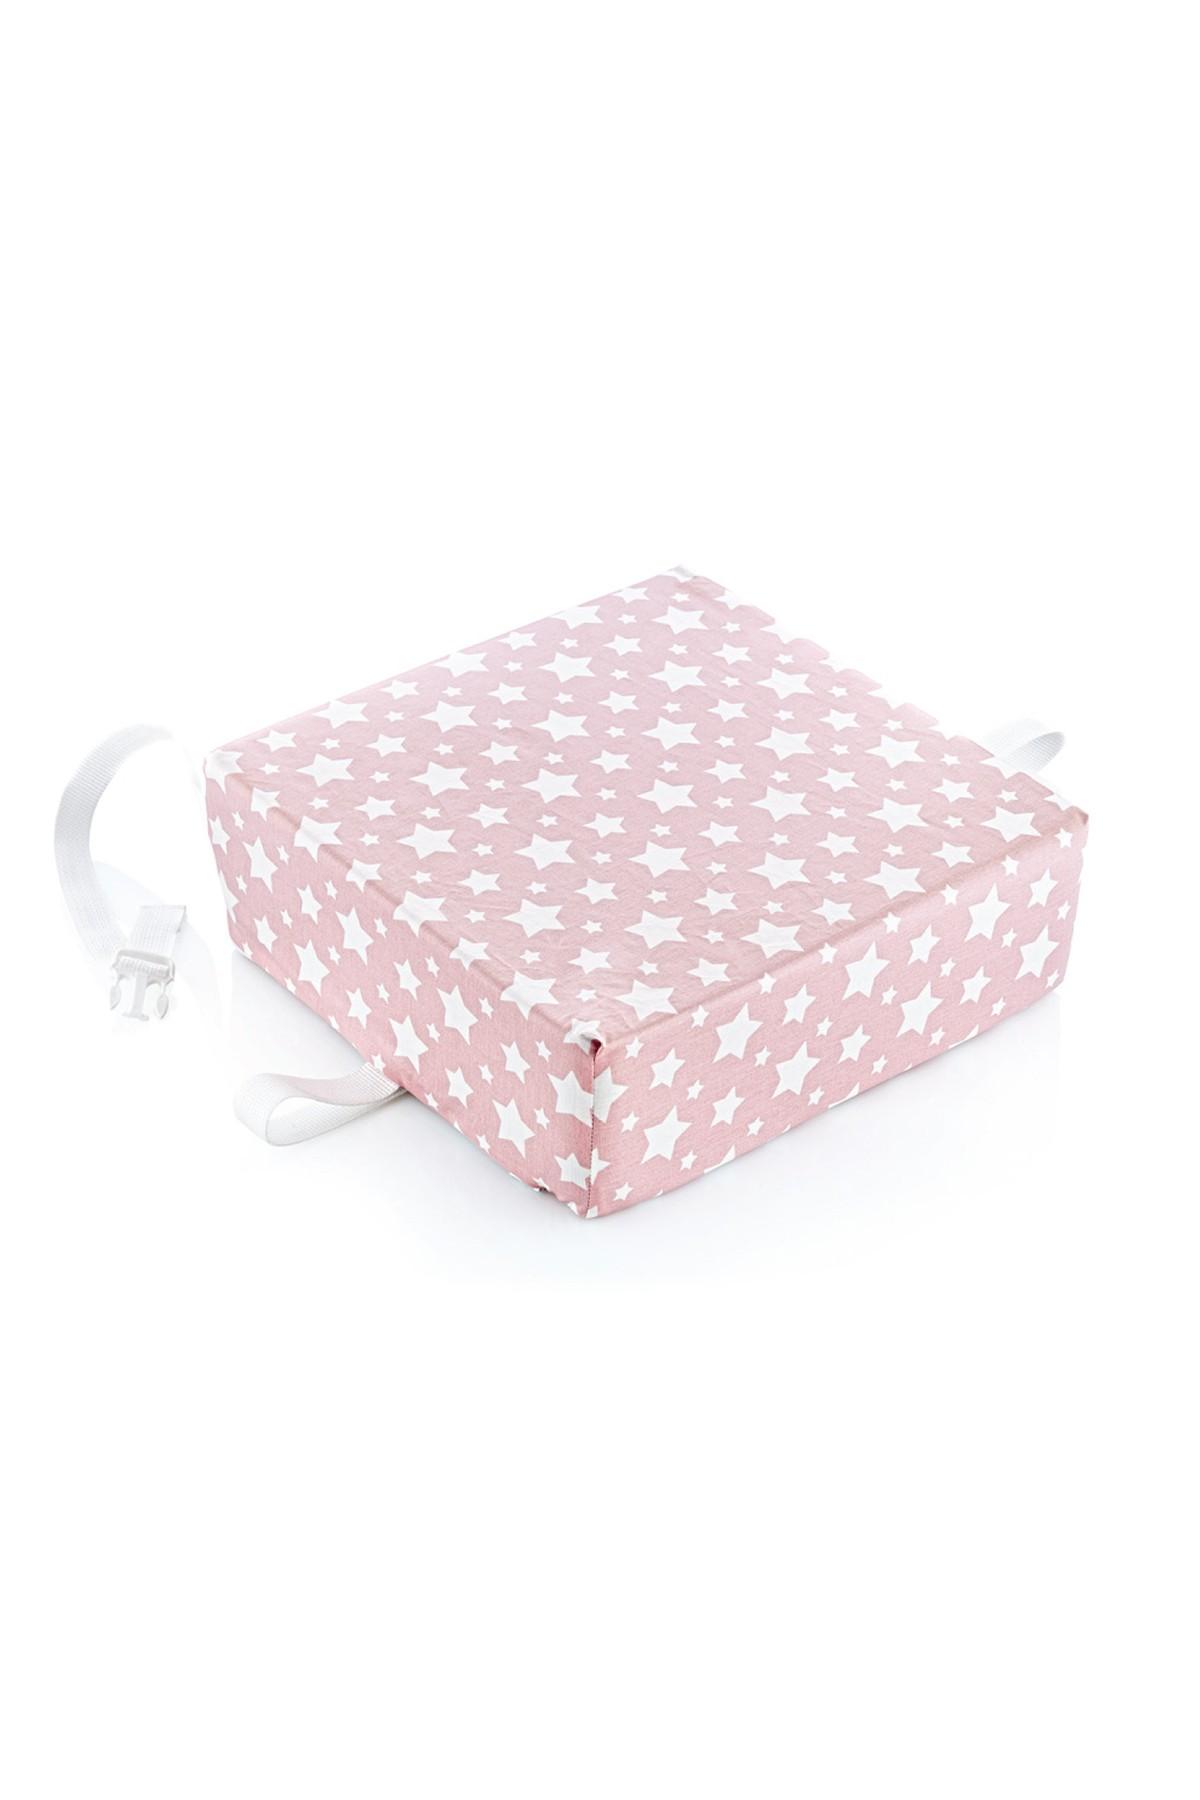 Image of BabyJem Booster Stoelverhoger EasyClean Pink Star 35277